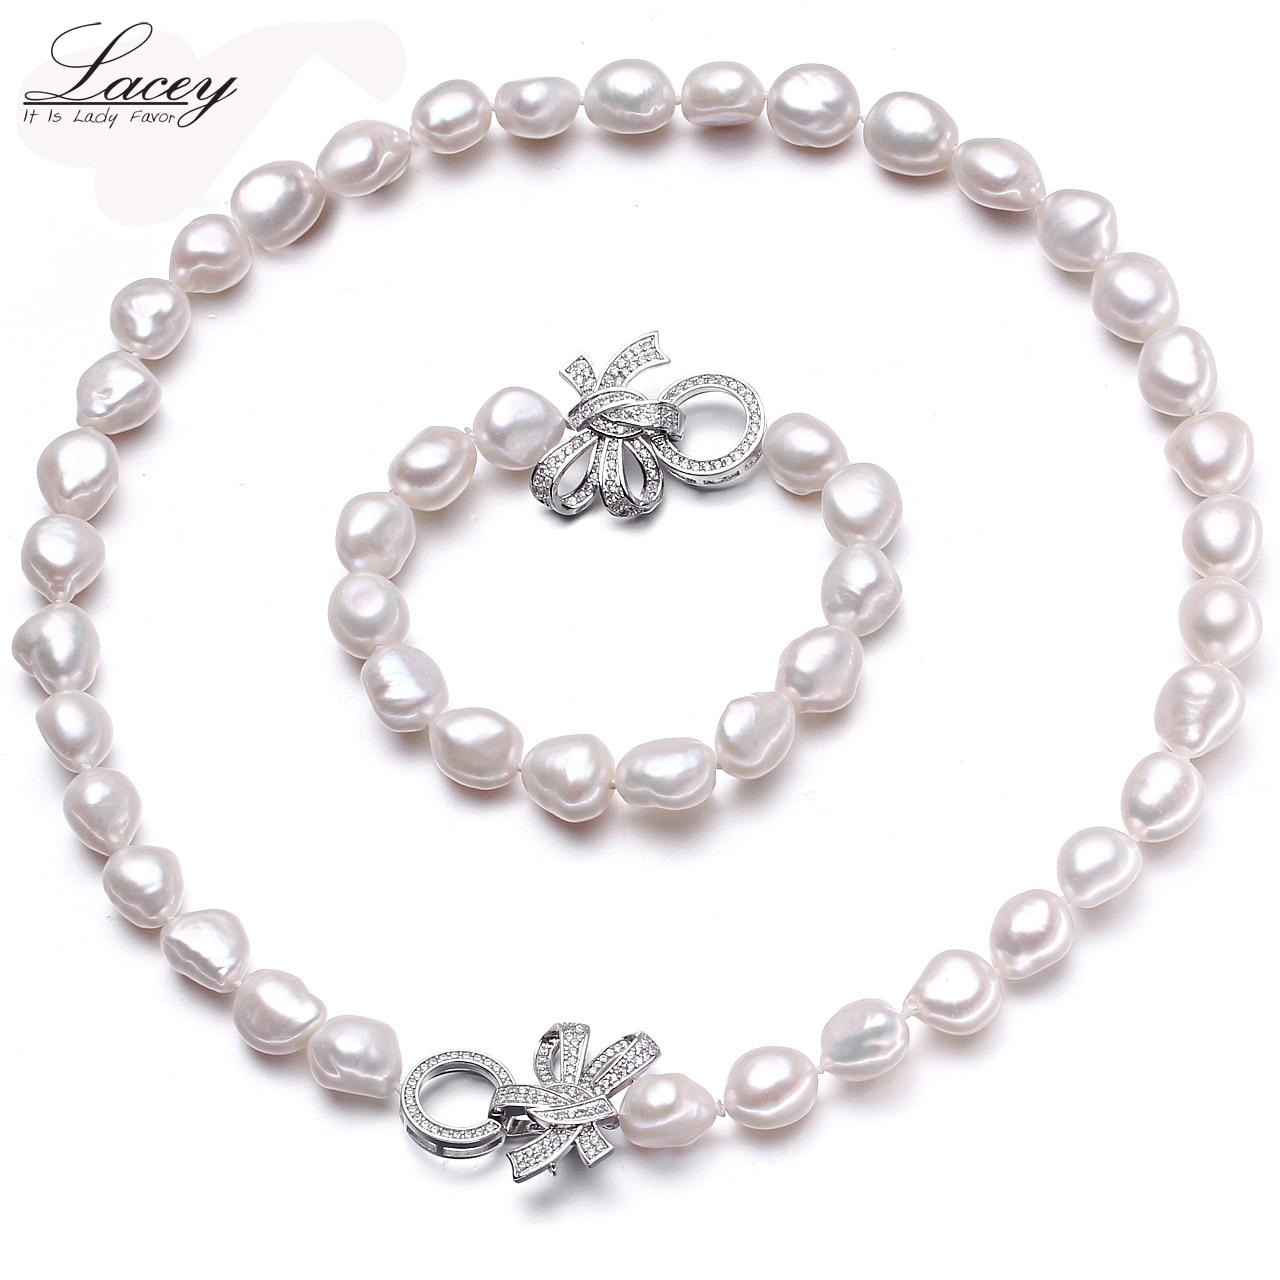 Natural cultivado conjuntos de jóias de pérolas de água doce mulheres baroque10-11mm conjuntos de pérolas pulseira colar de jóias finas jóias